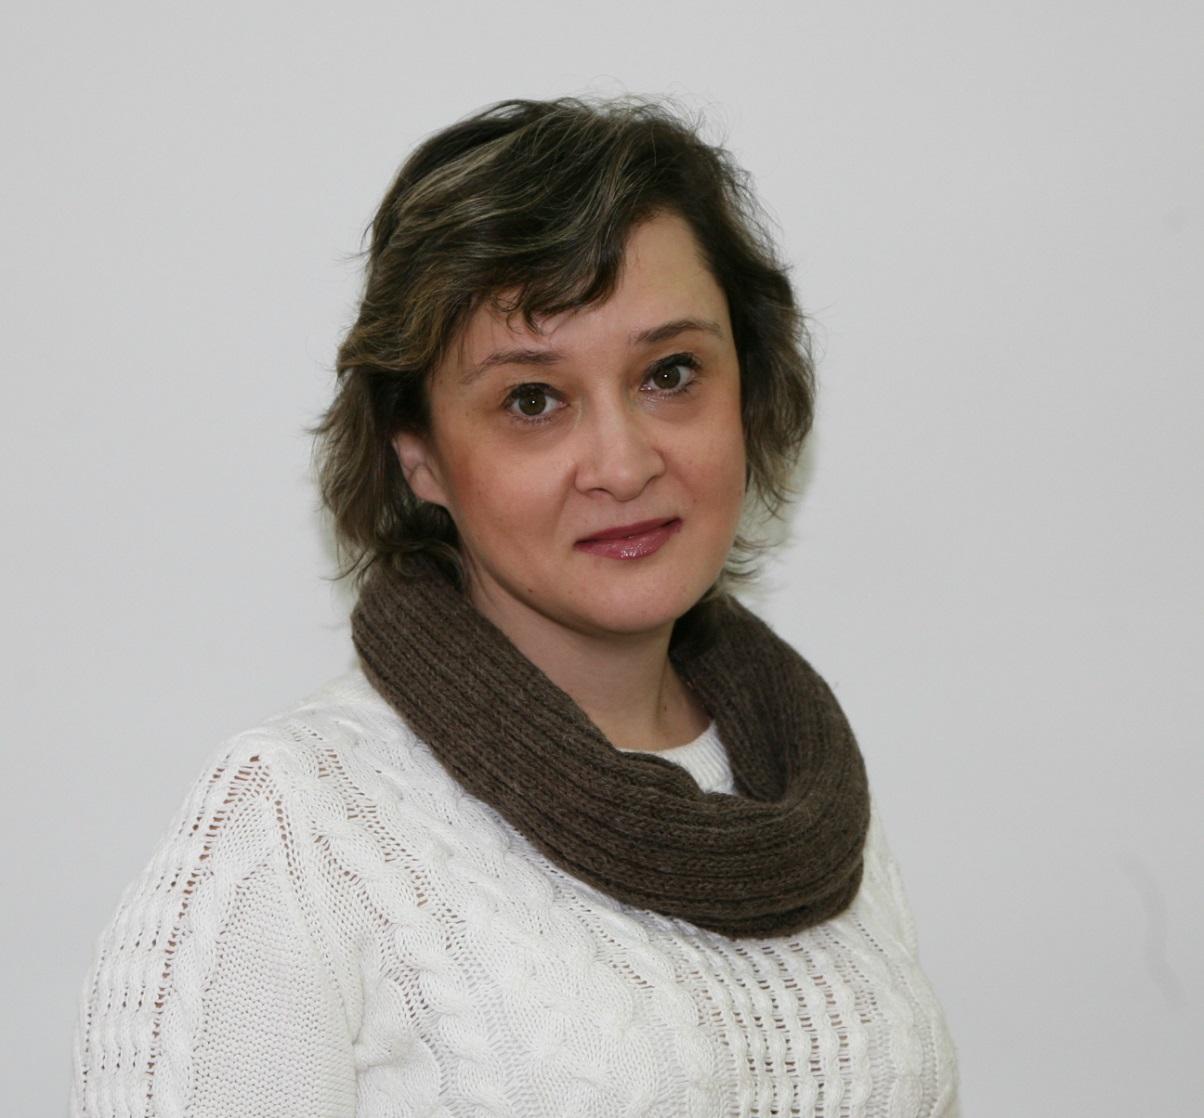 Коледова Людмила Александровна